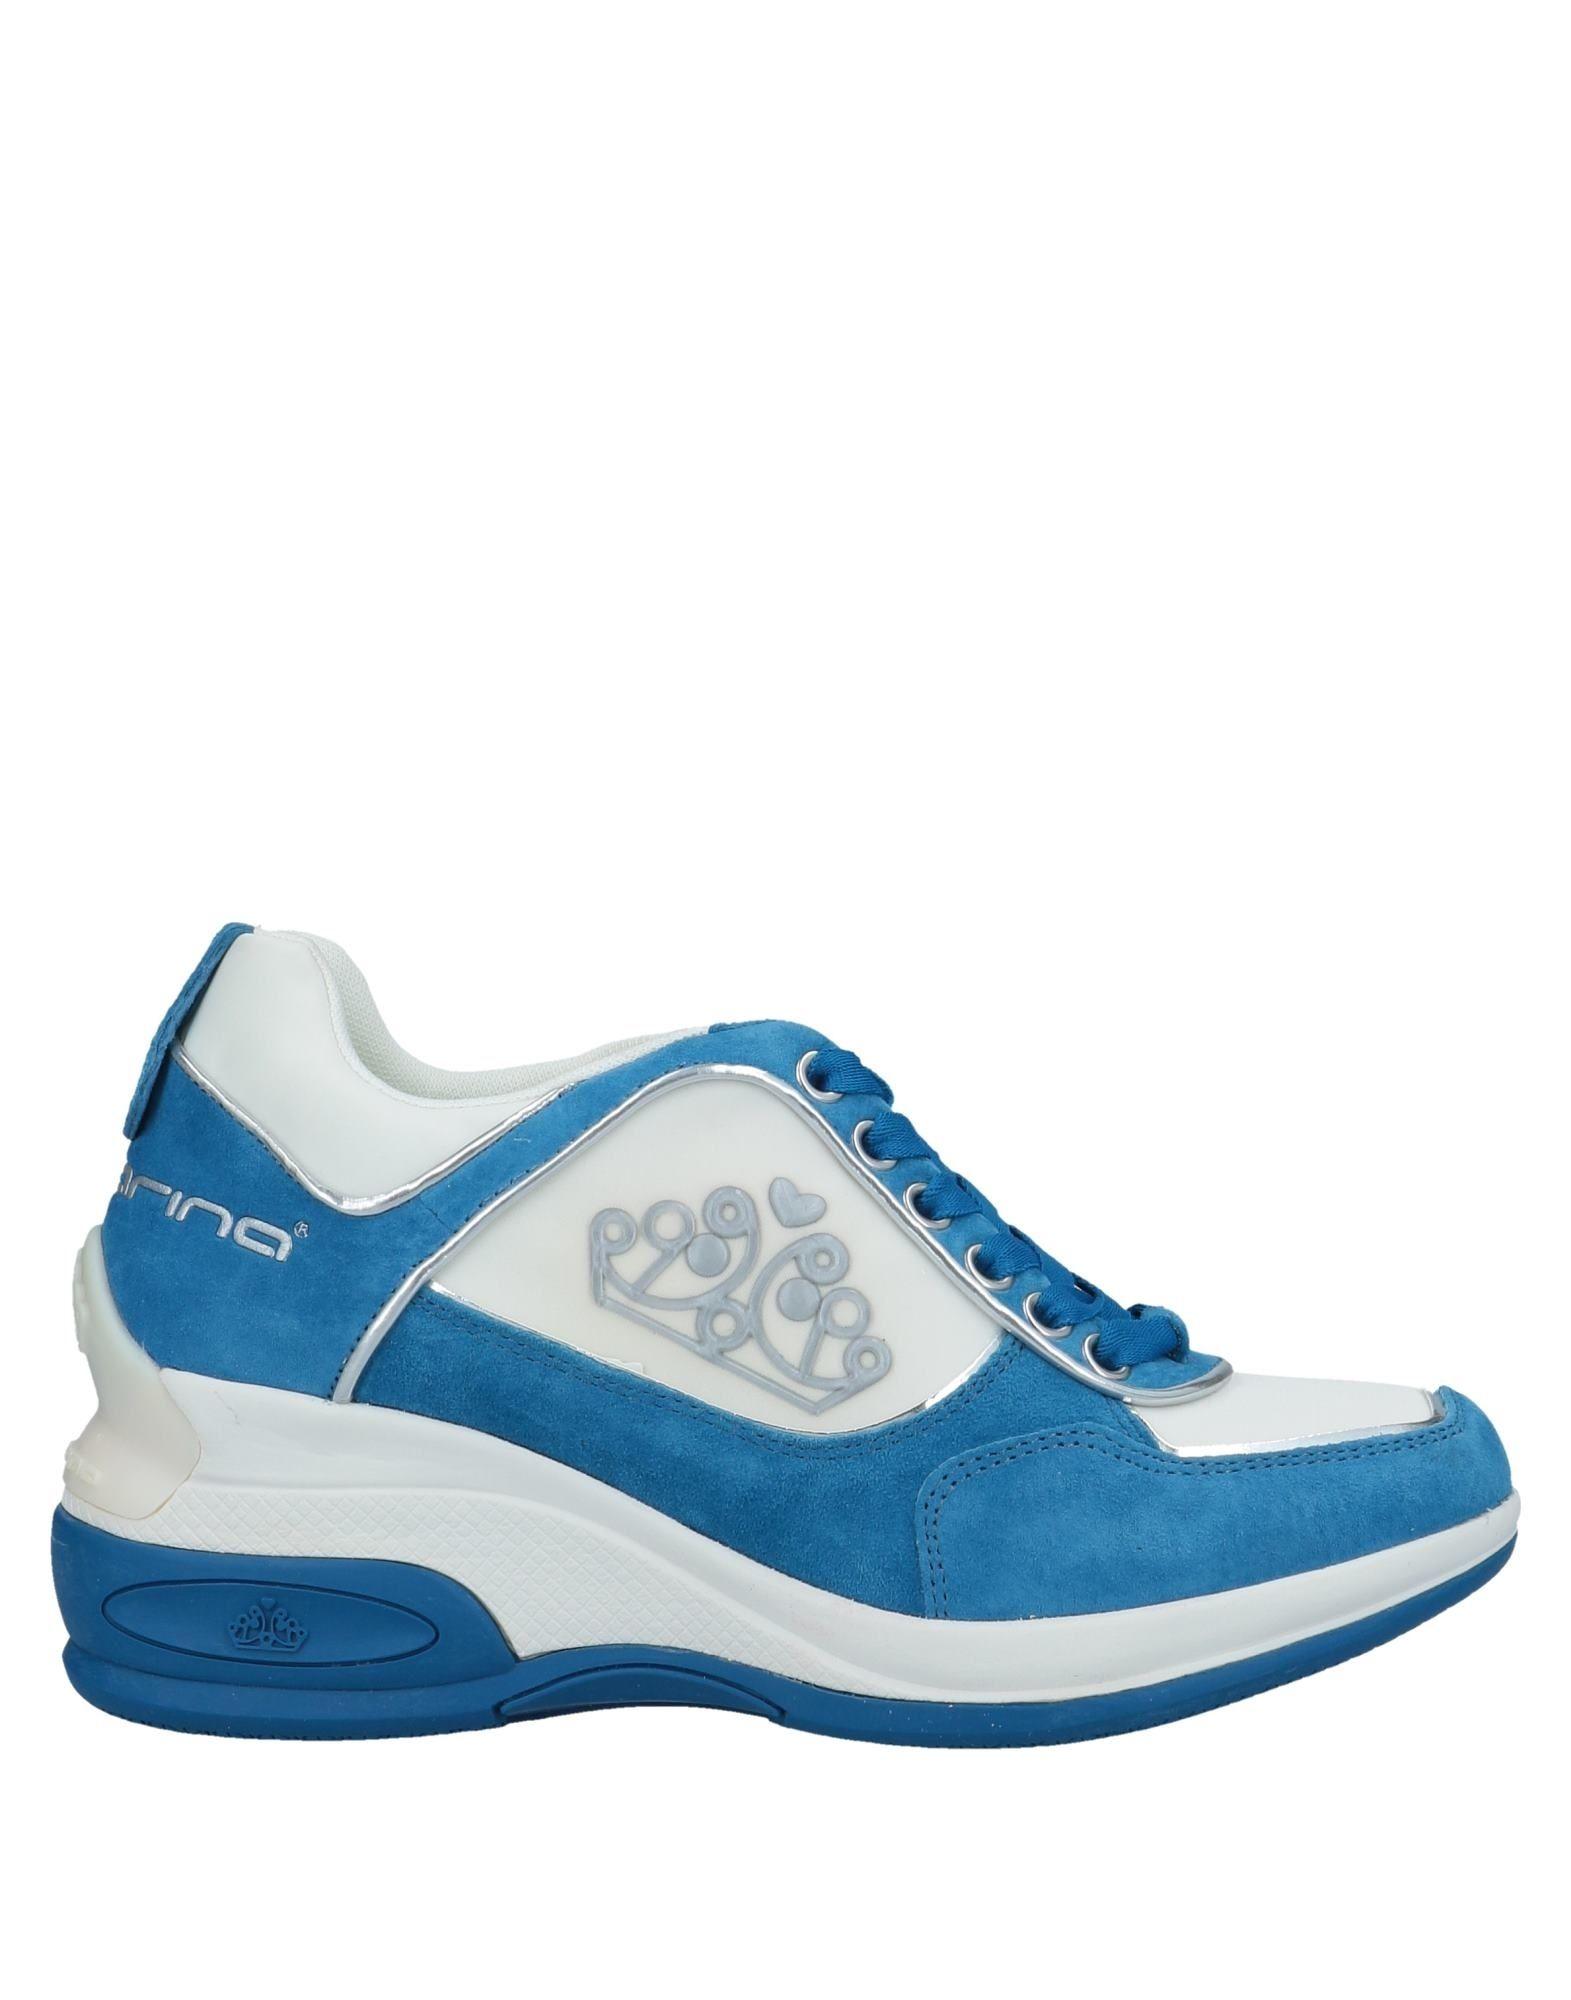 Fornarina Sneakers - Australia Women Fornarina Sneakers online on  Australia - - 11554111EF 4133f5